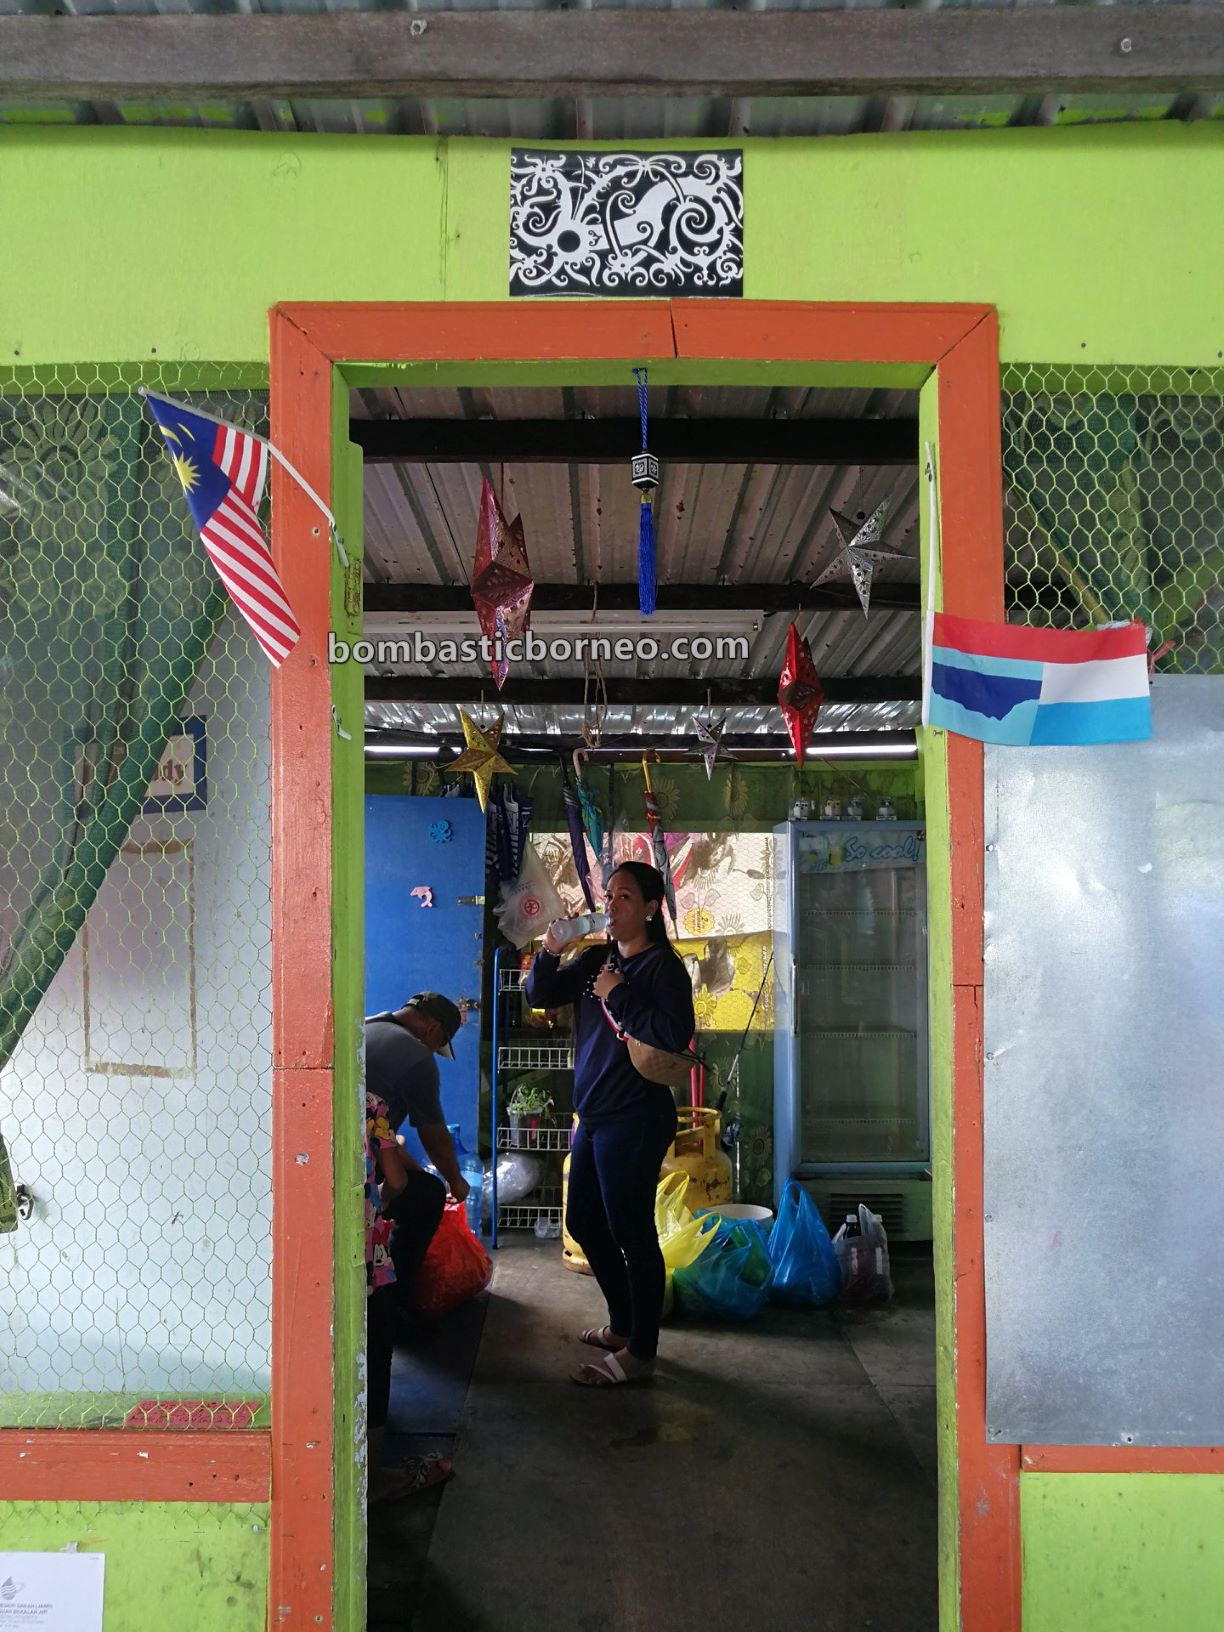 Island, exploration, jelajah, jetty, Transportation, Kampung Melayu, malay village, Malaysia, Tourism, Travel Guide,